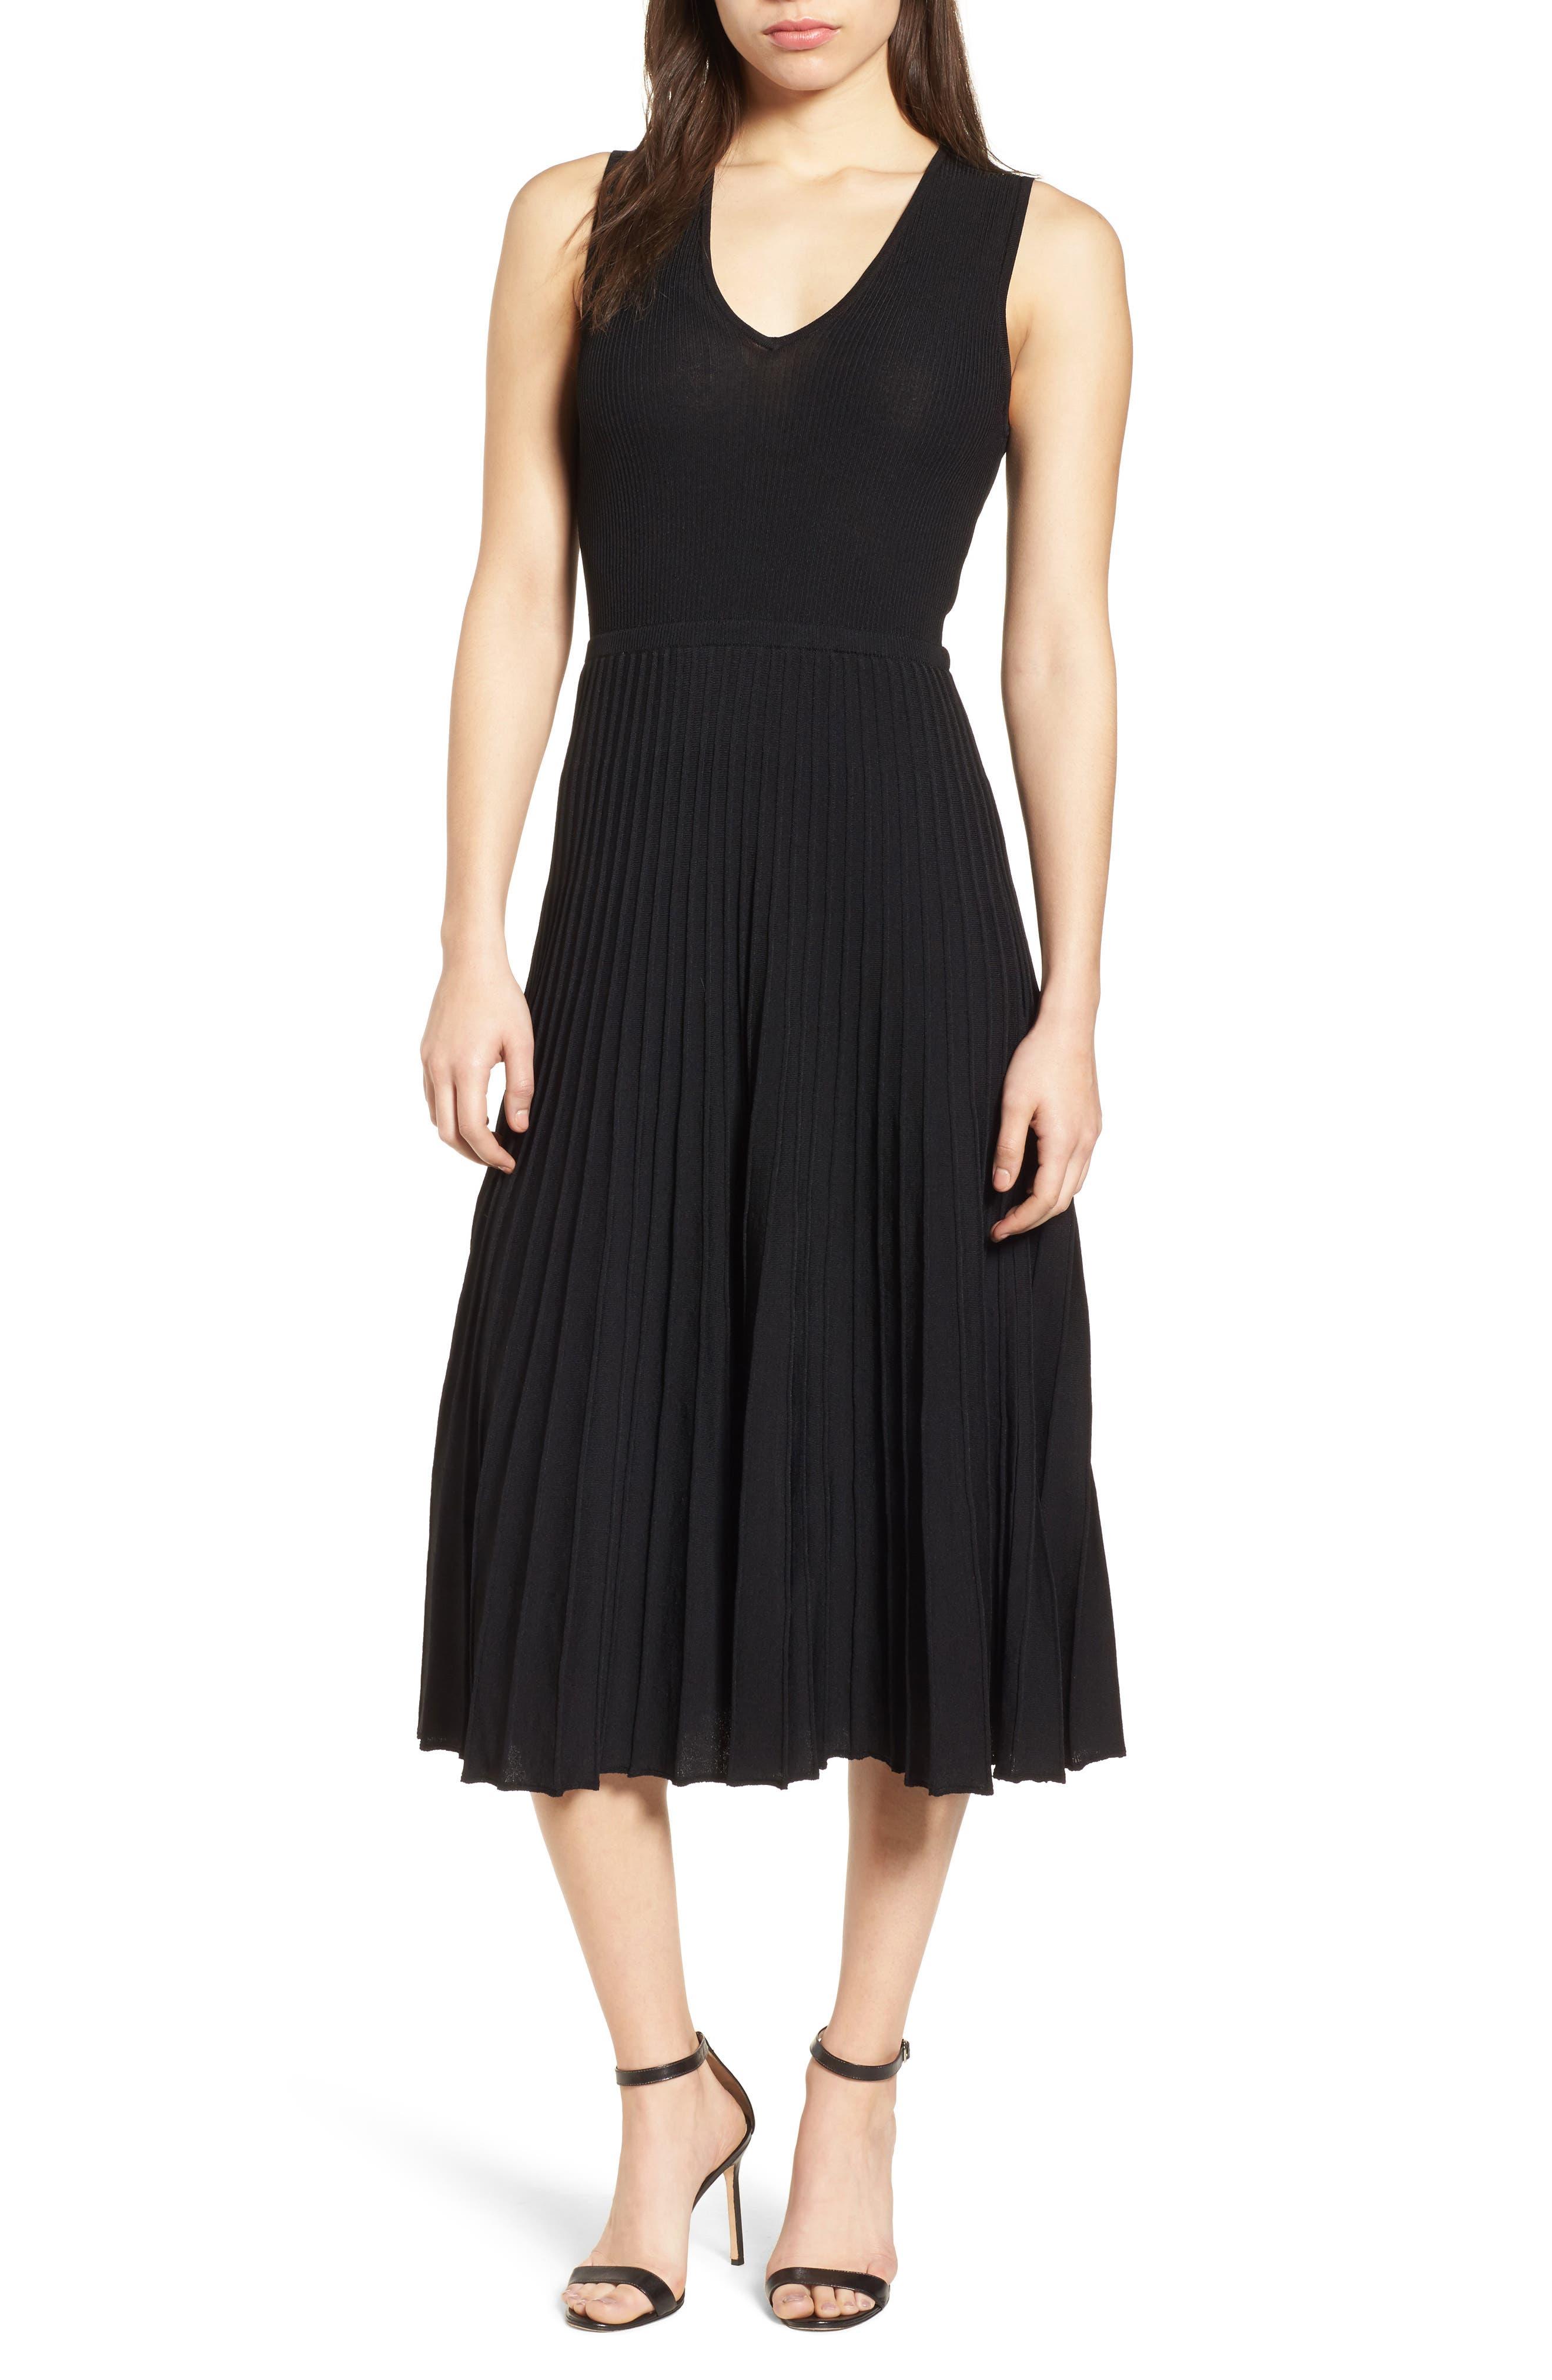 New York Pleated Sweater Midi Dress,                         Main,                         color, Black